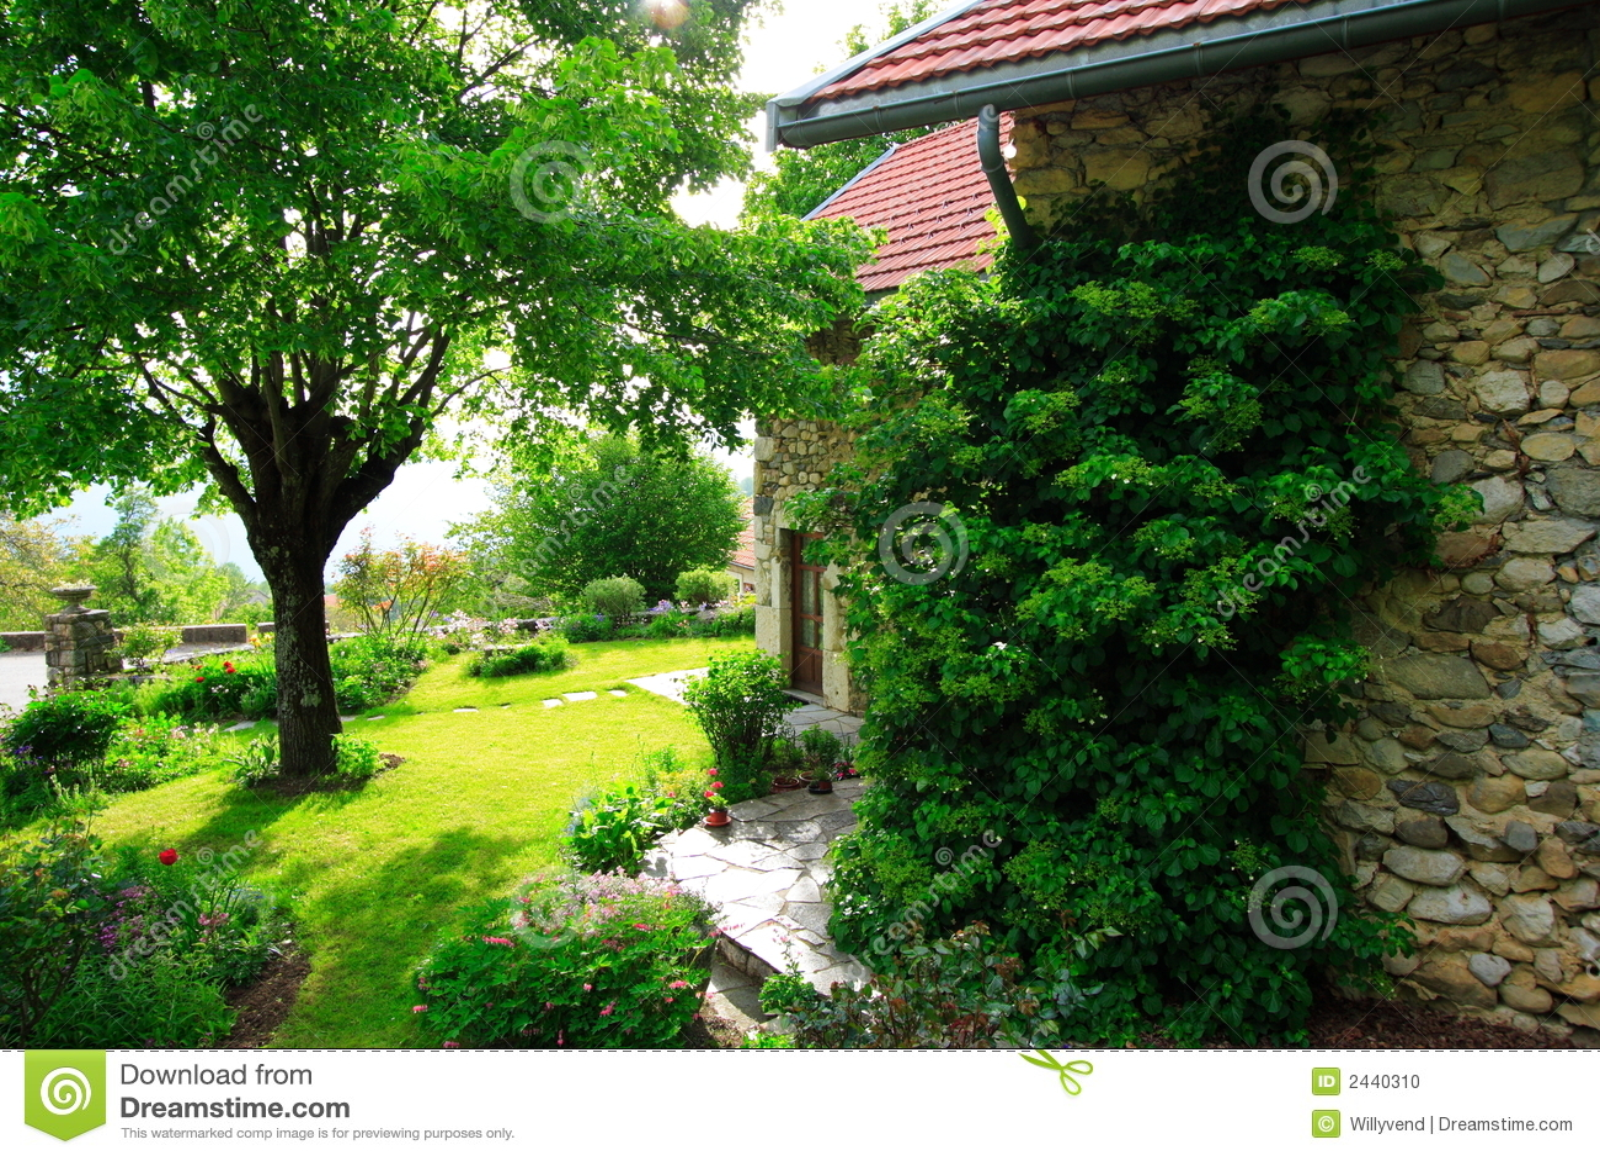 Old garden house - Old Garden And House Stock Photo